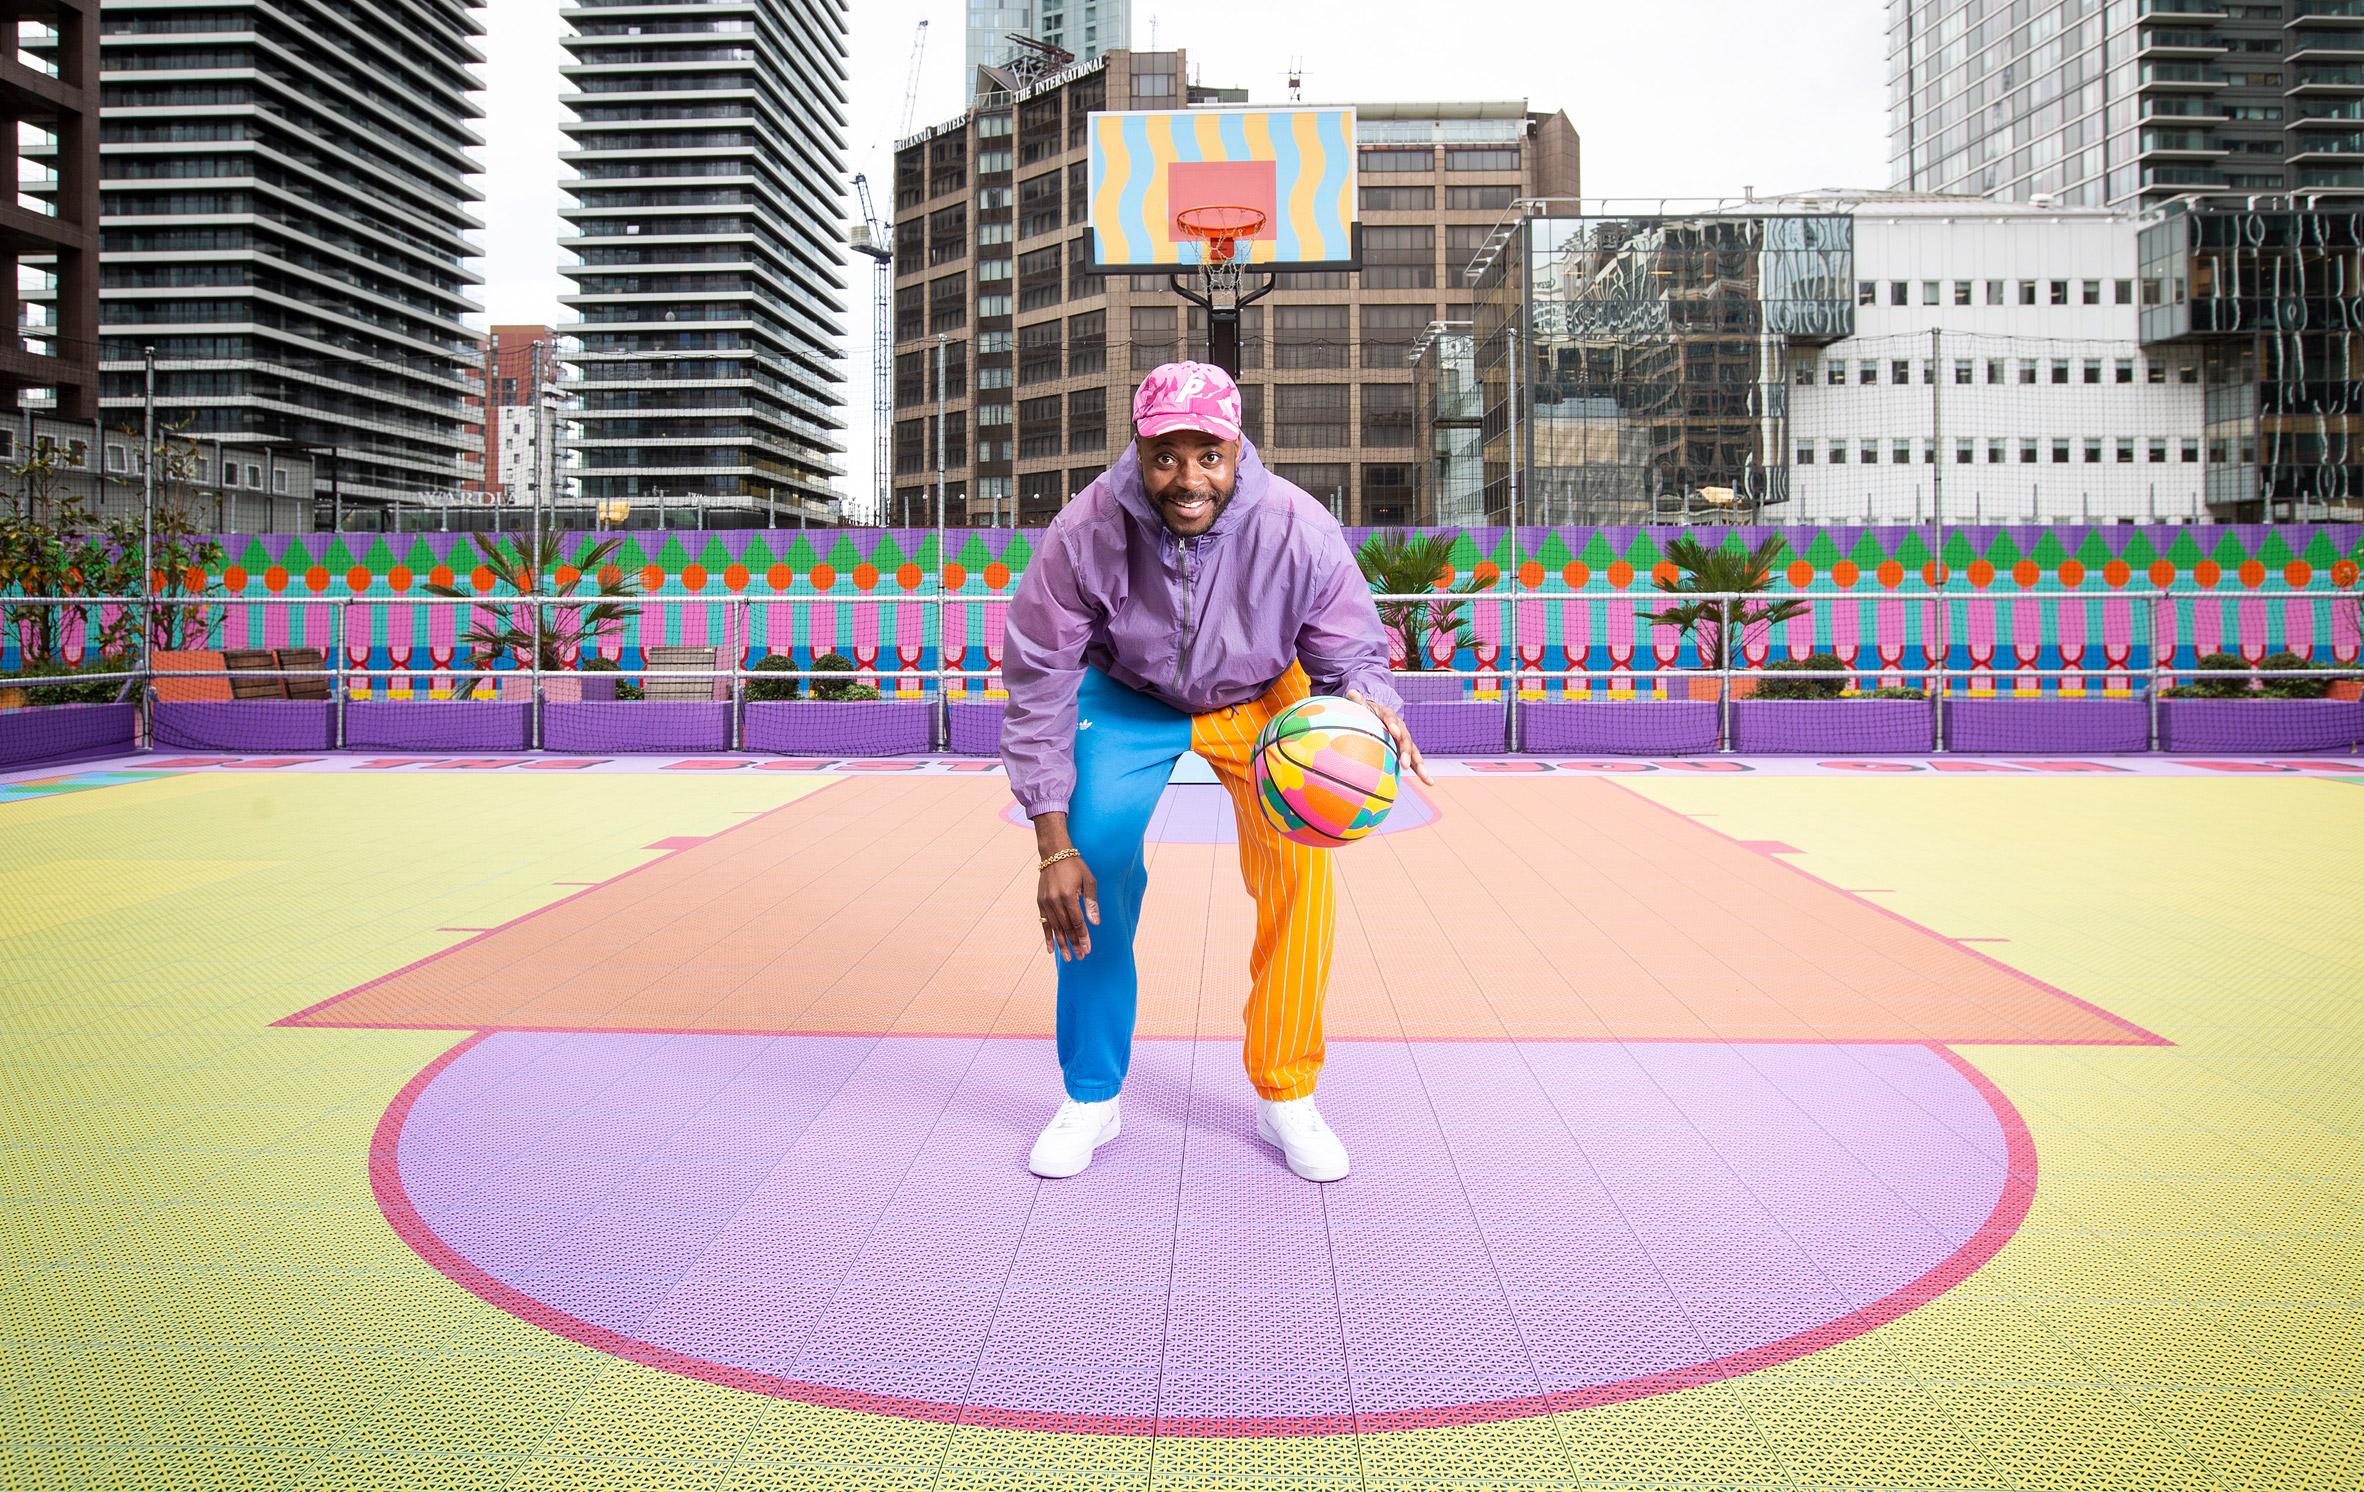 Yinka Ilori dribbling on colourful basketball court